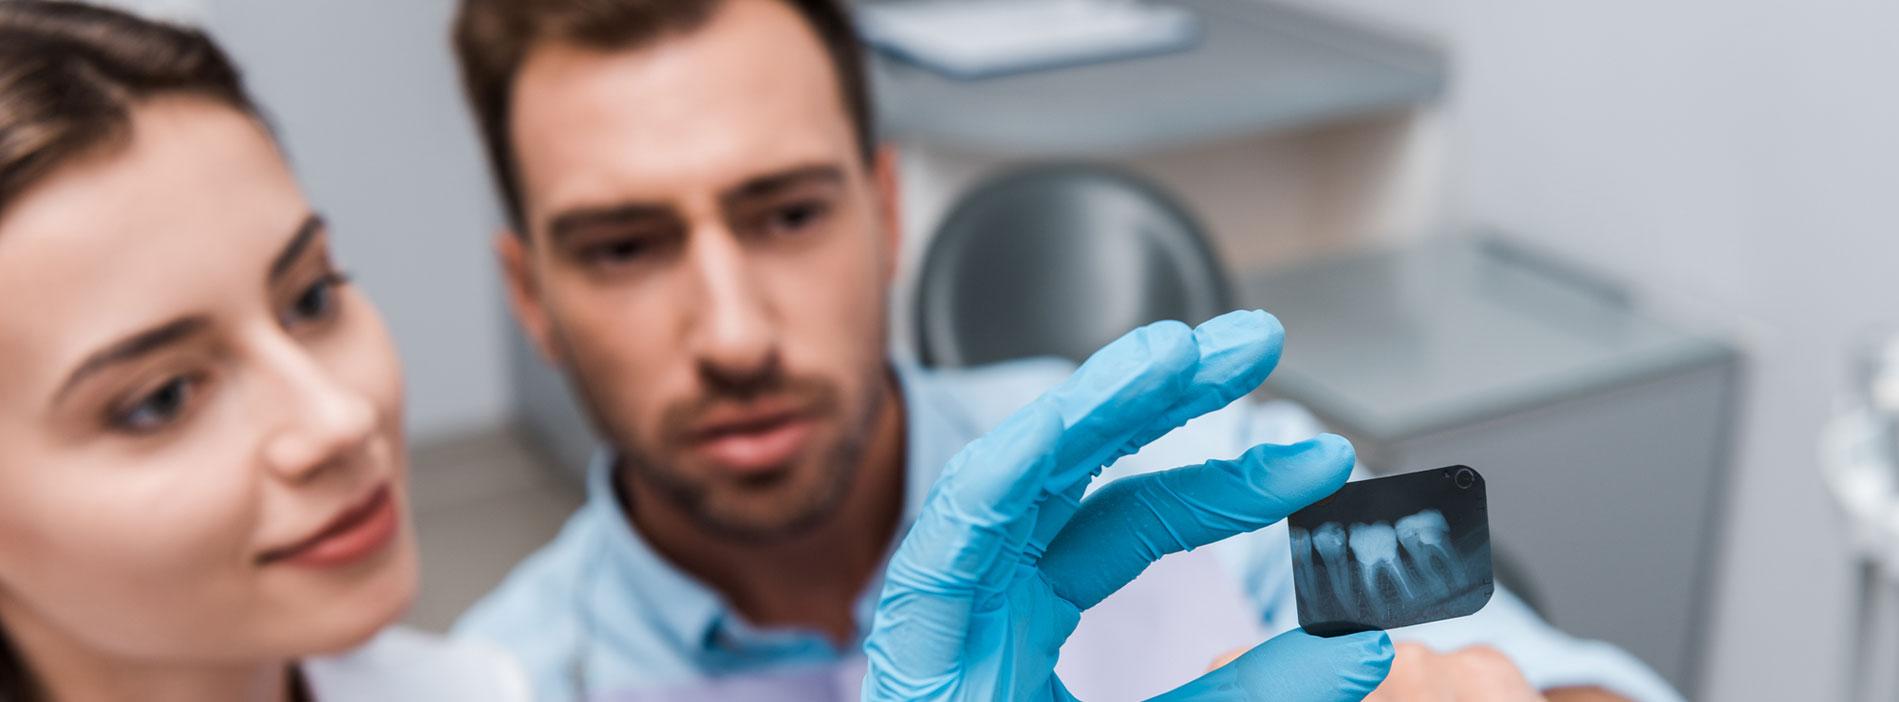 Dentists examining a teeth x-ray